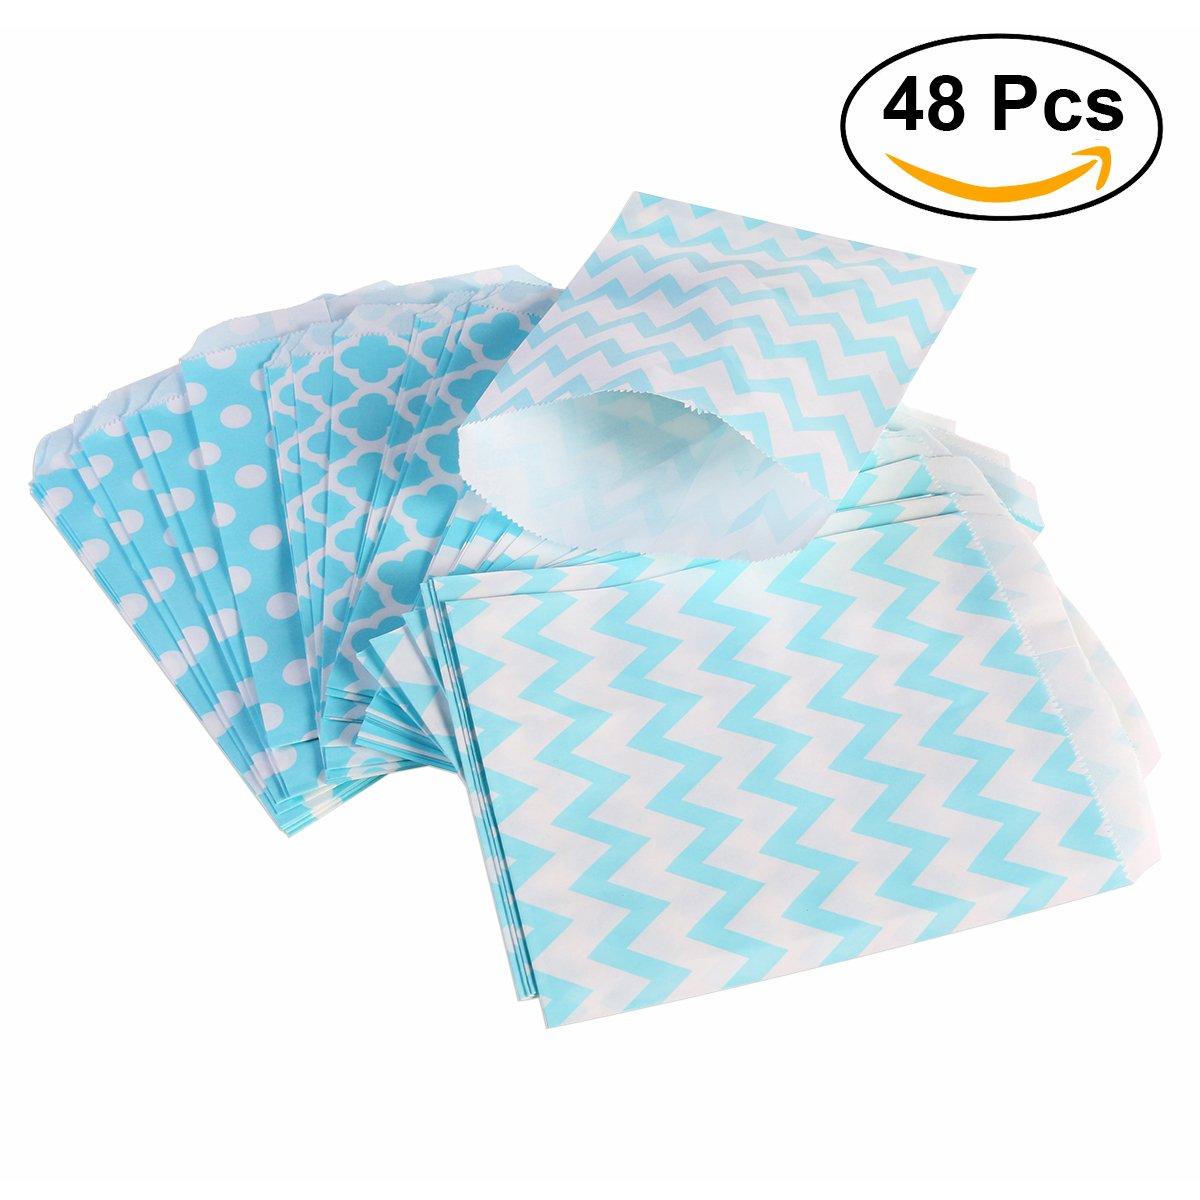 NUOLUX 48pcs rayas de lunares Chevron Boda de la barra de caramelo bolsas de regalo del partido bolsas de papel bolsa (azul)